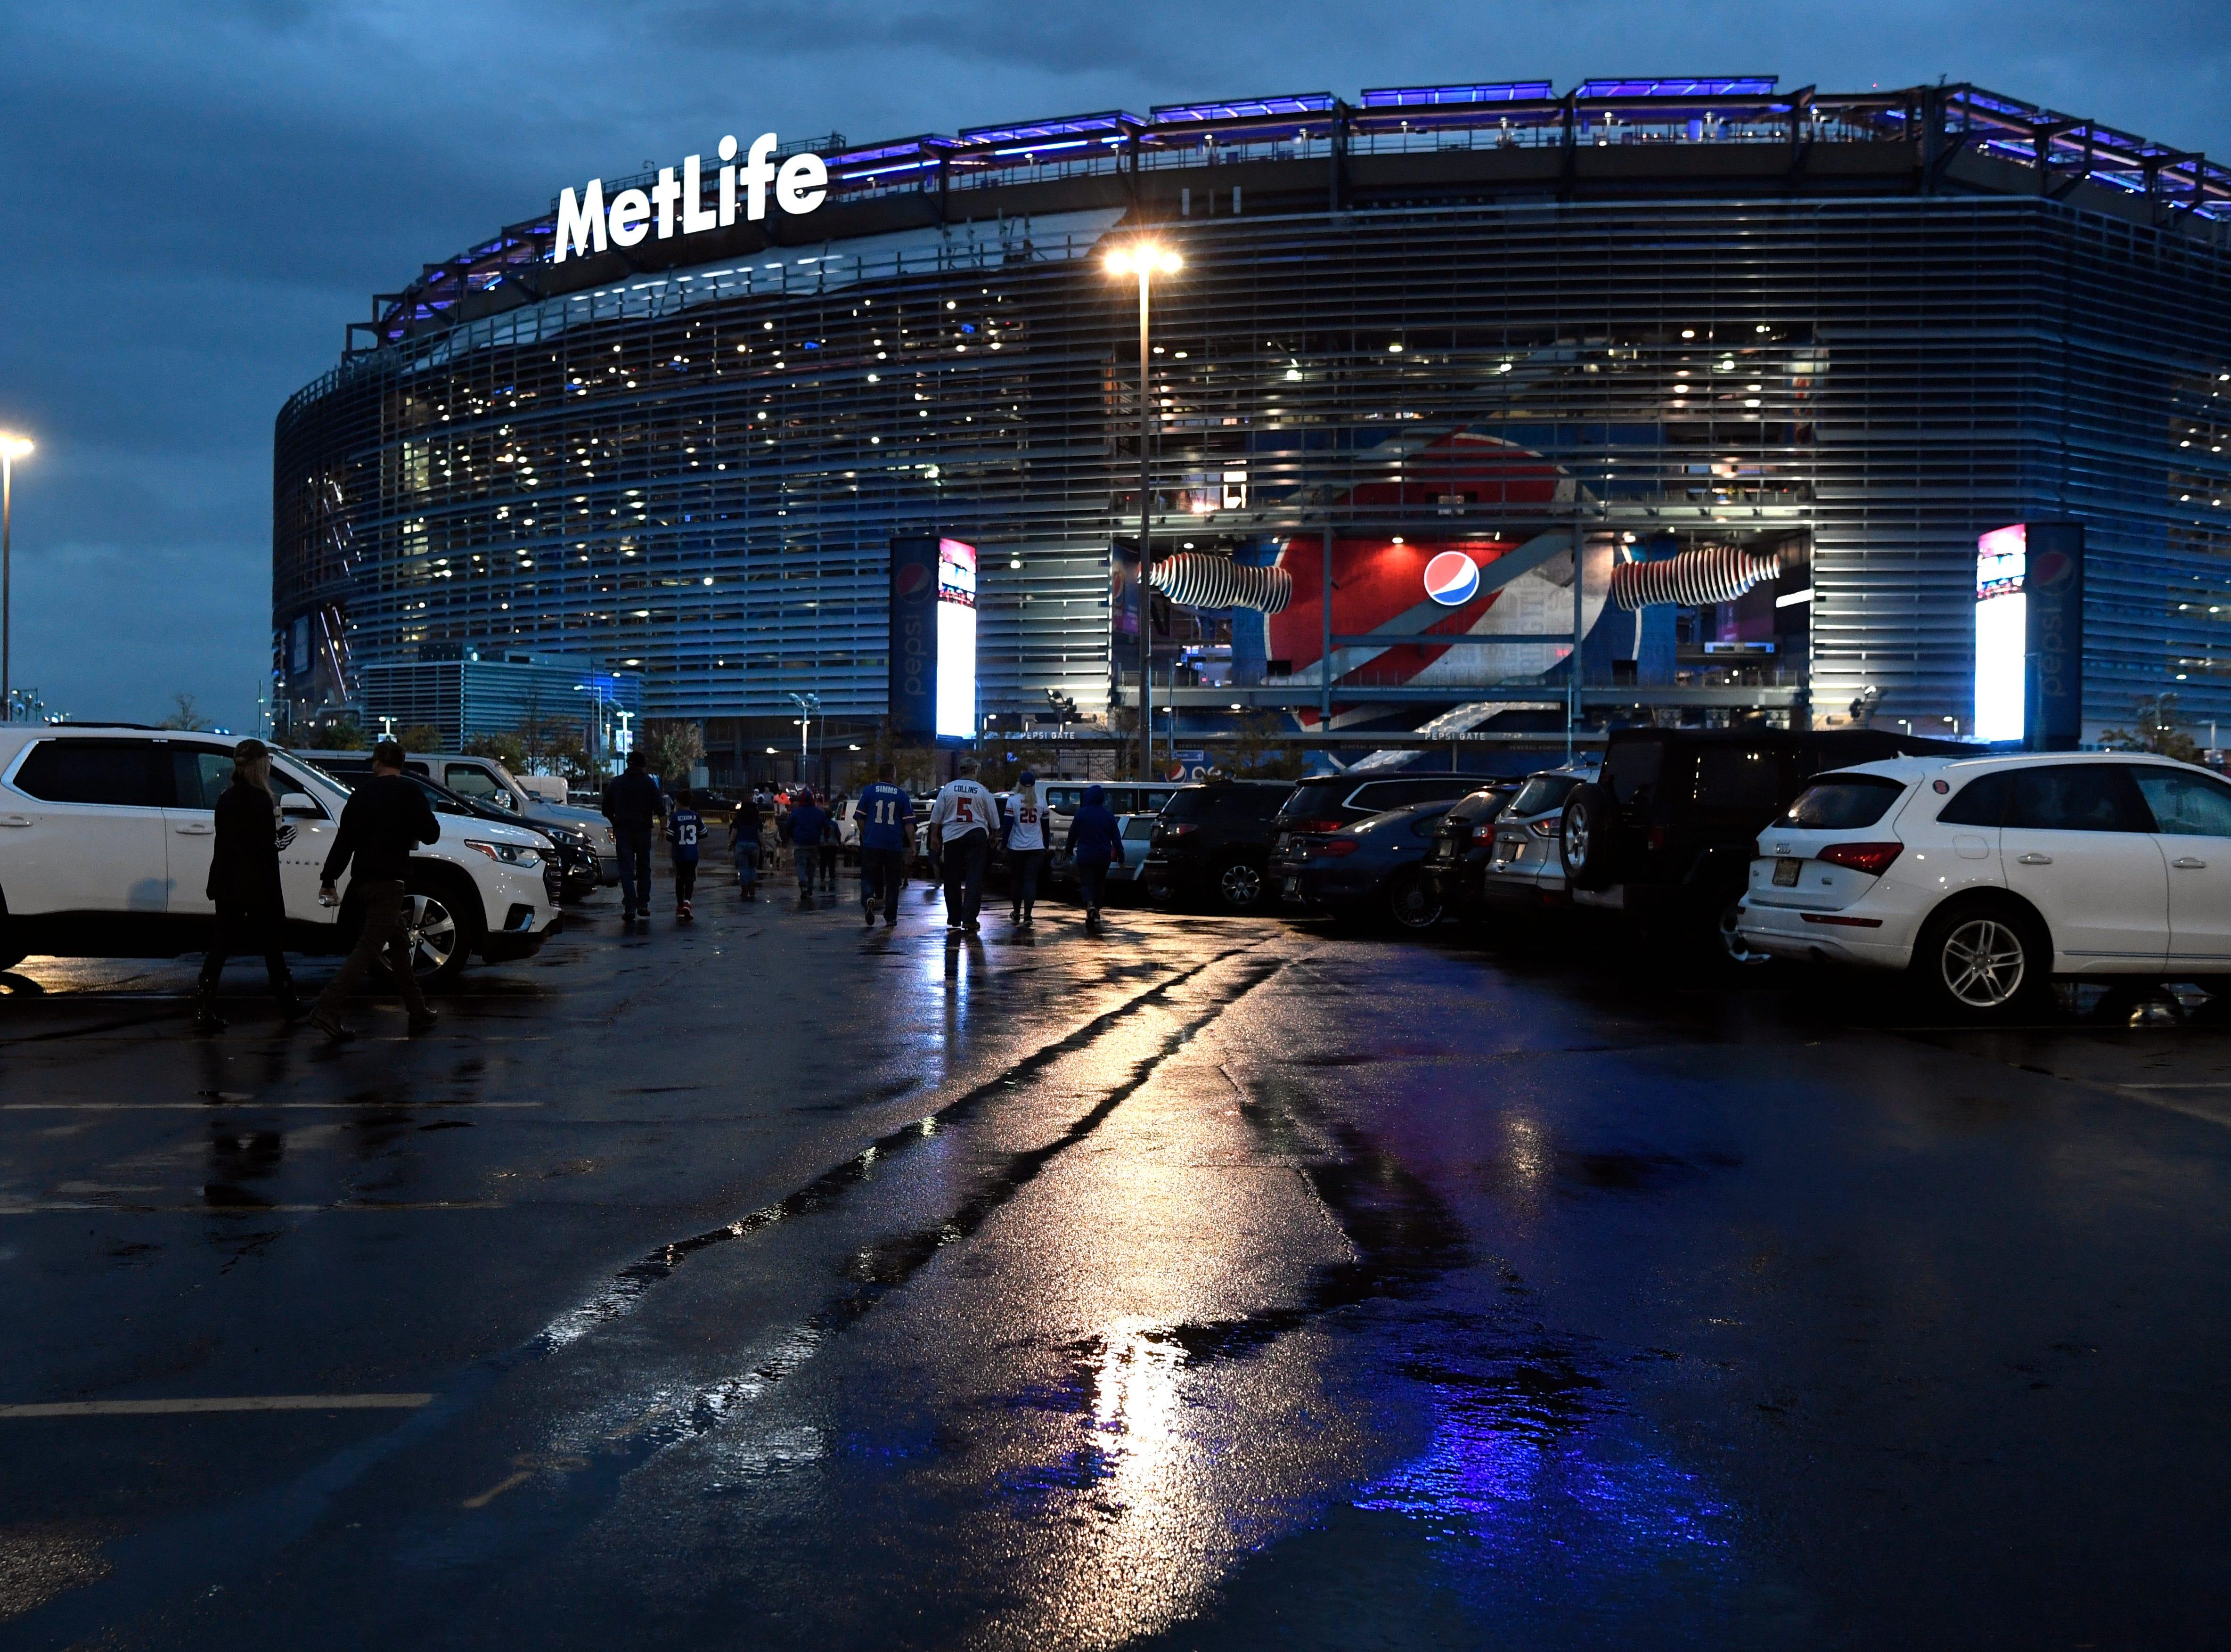 A rainy MetLife Stadium before the New York Giants face the Philadelphia Eagles on Thursday, Oct. 11, 2018.